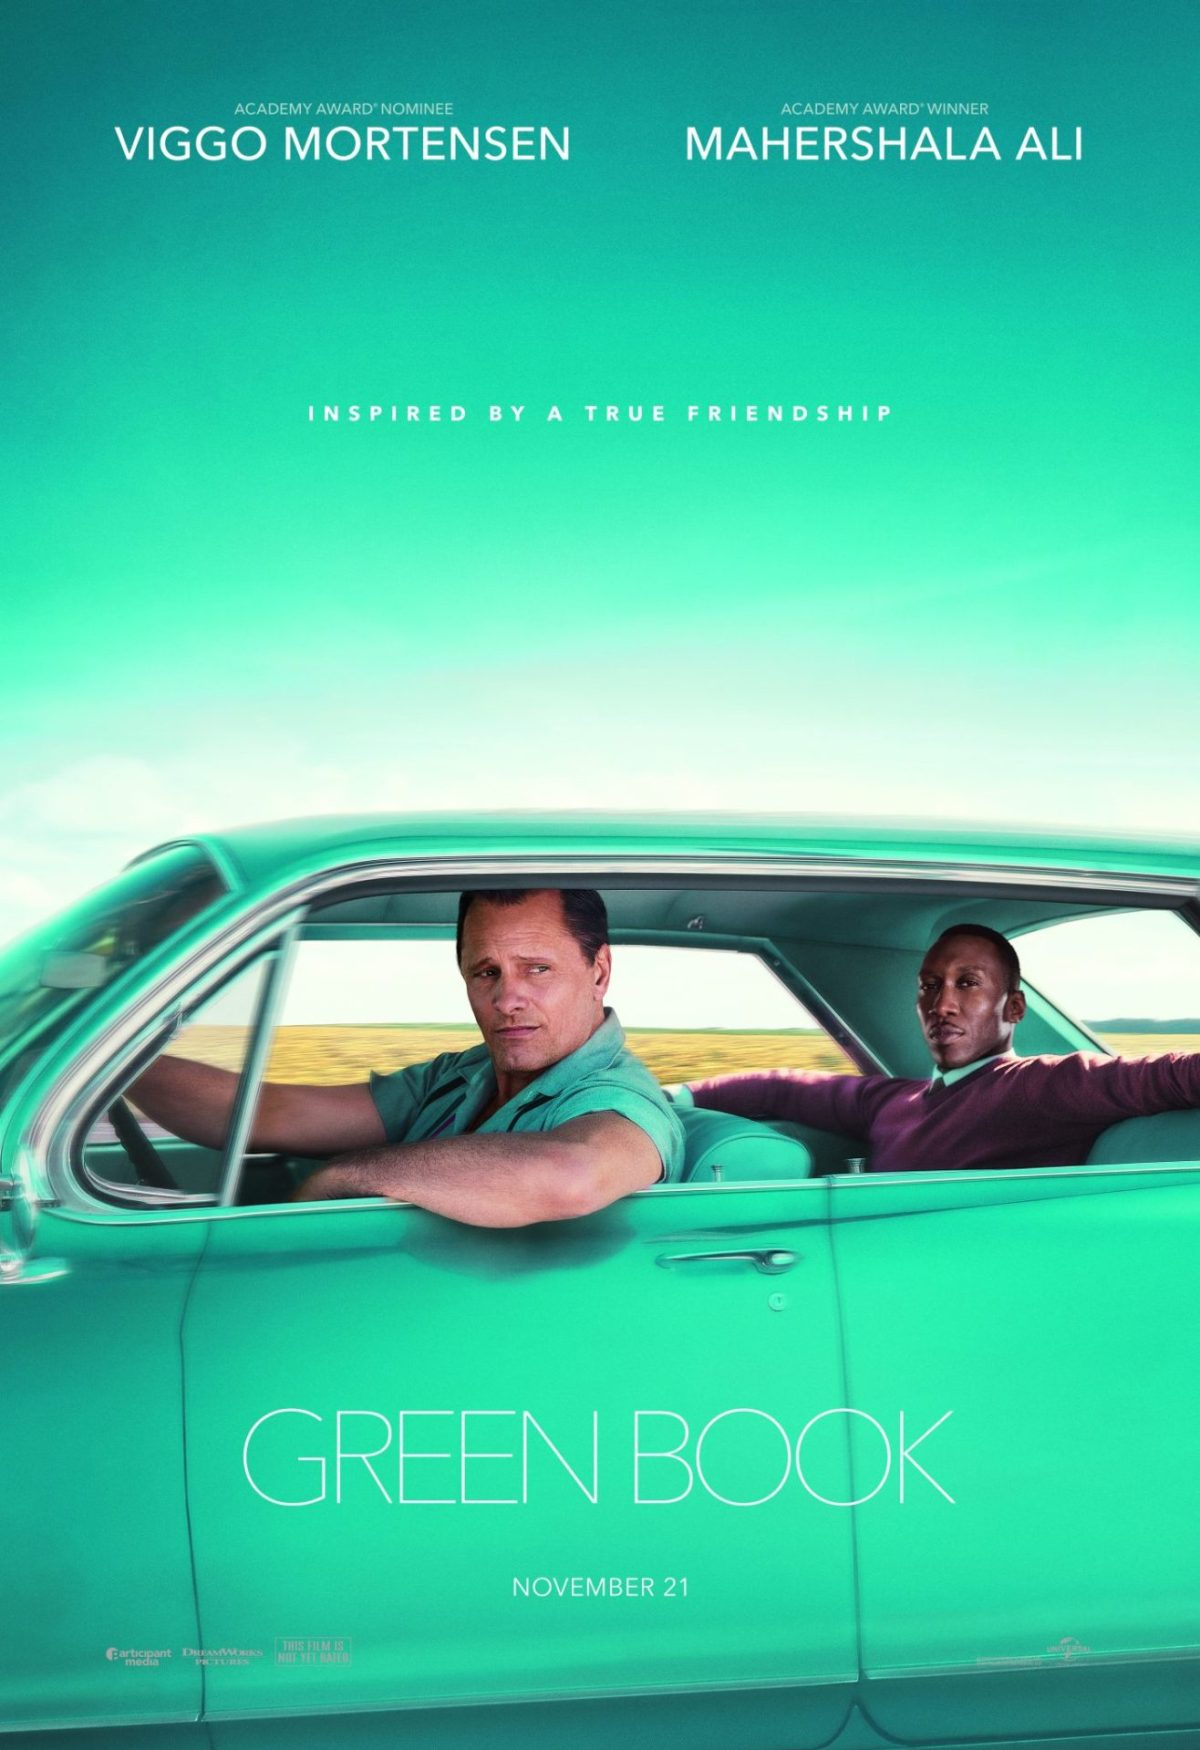 GreenBook_Adv_1sheet_poster_Eng_r1